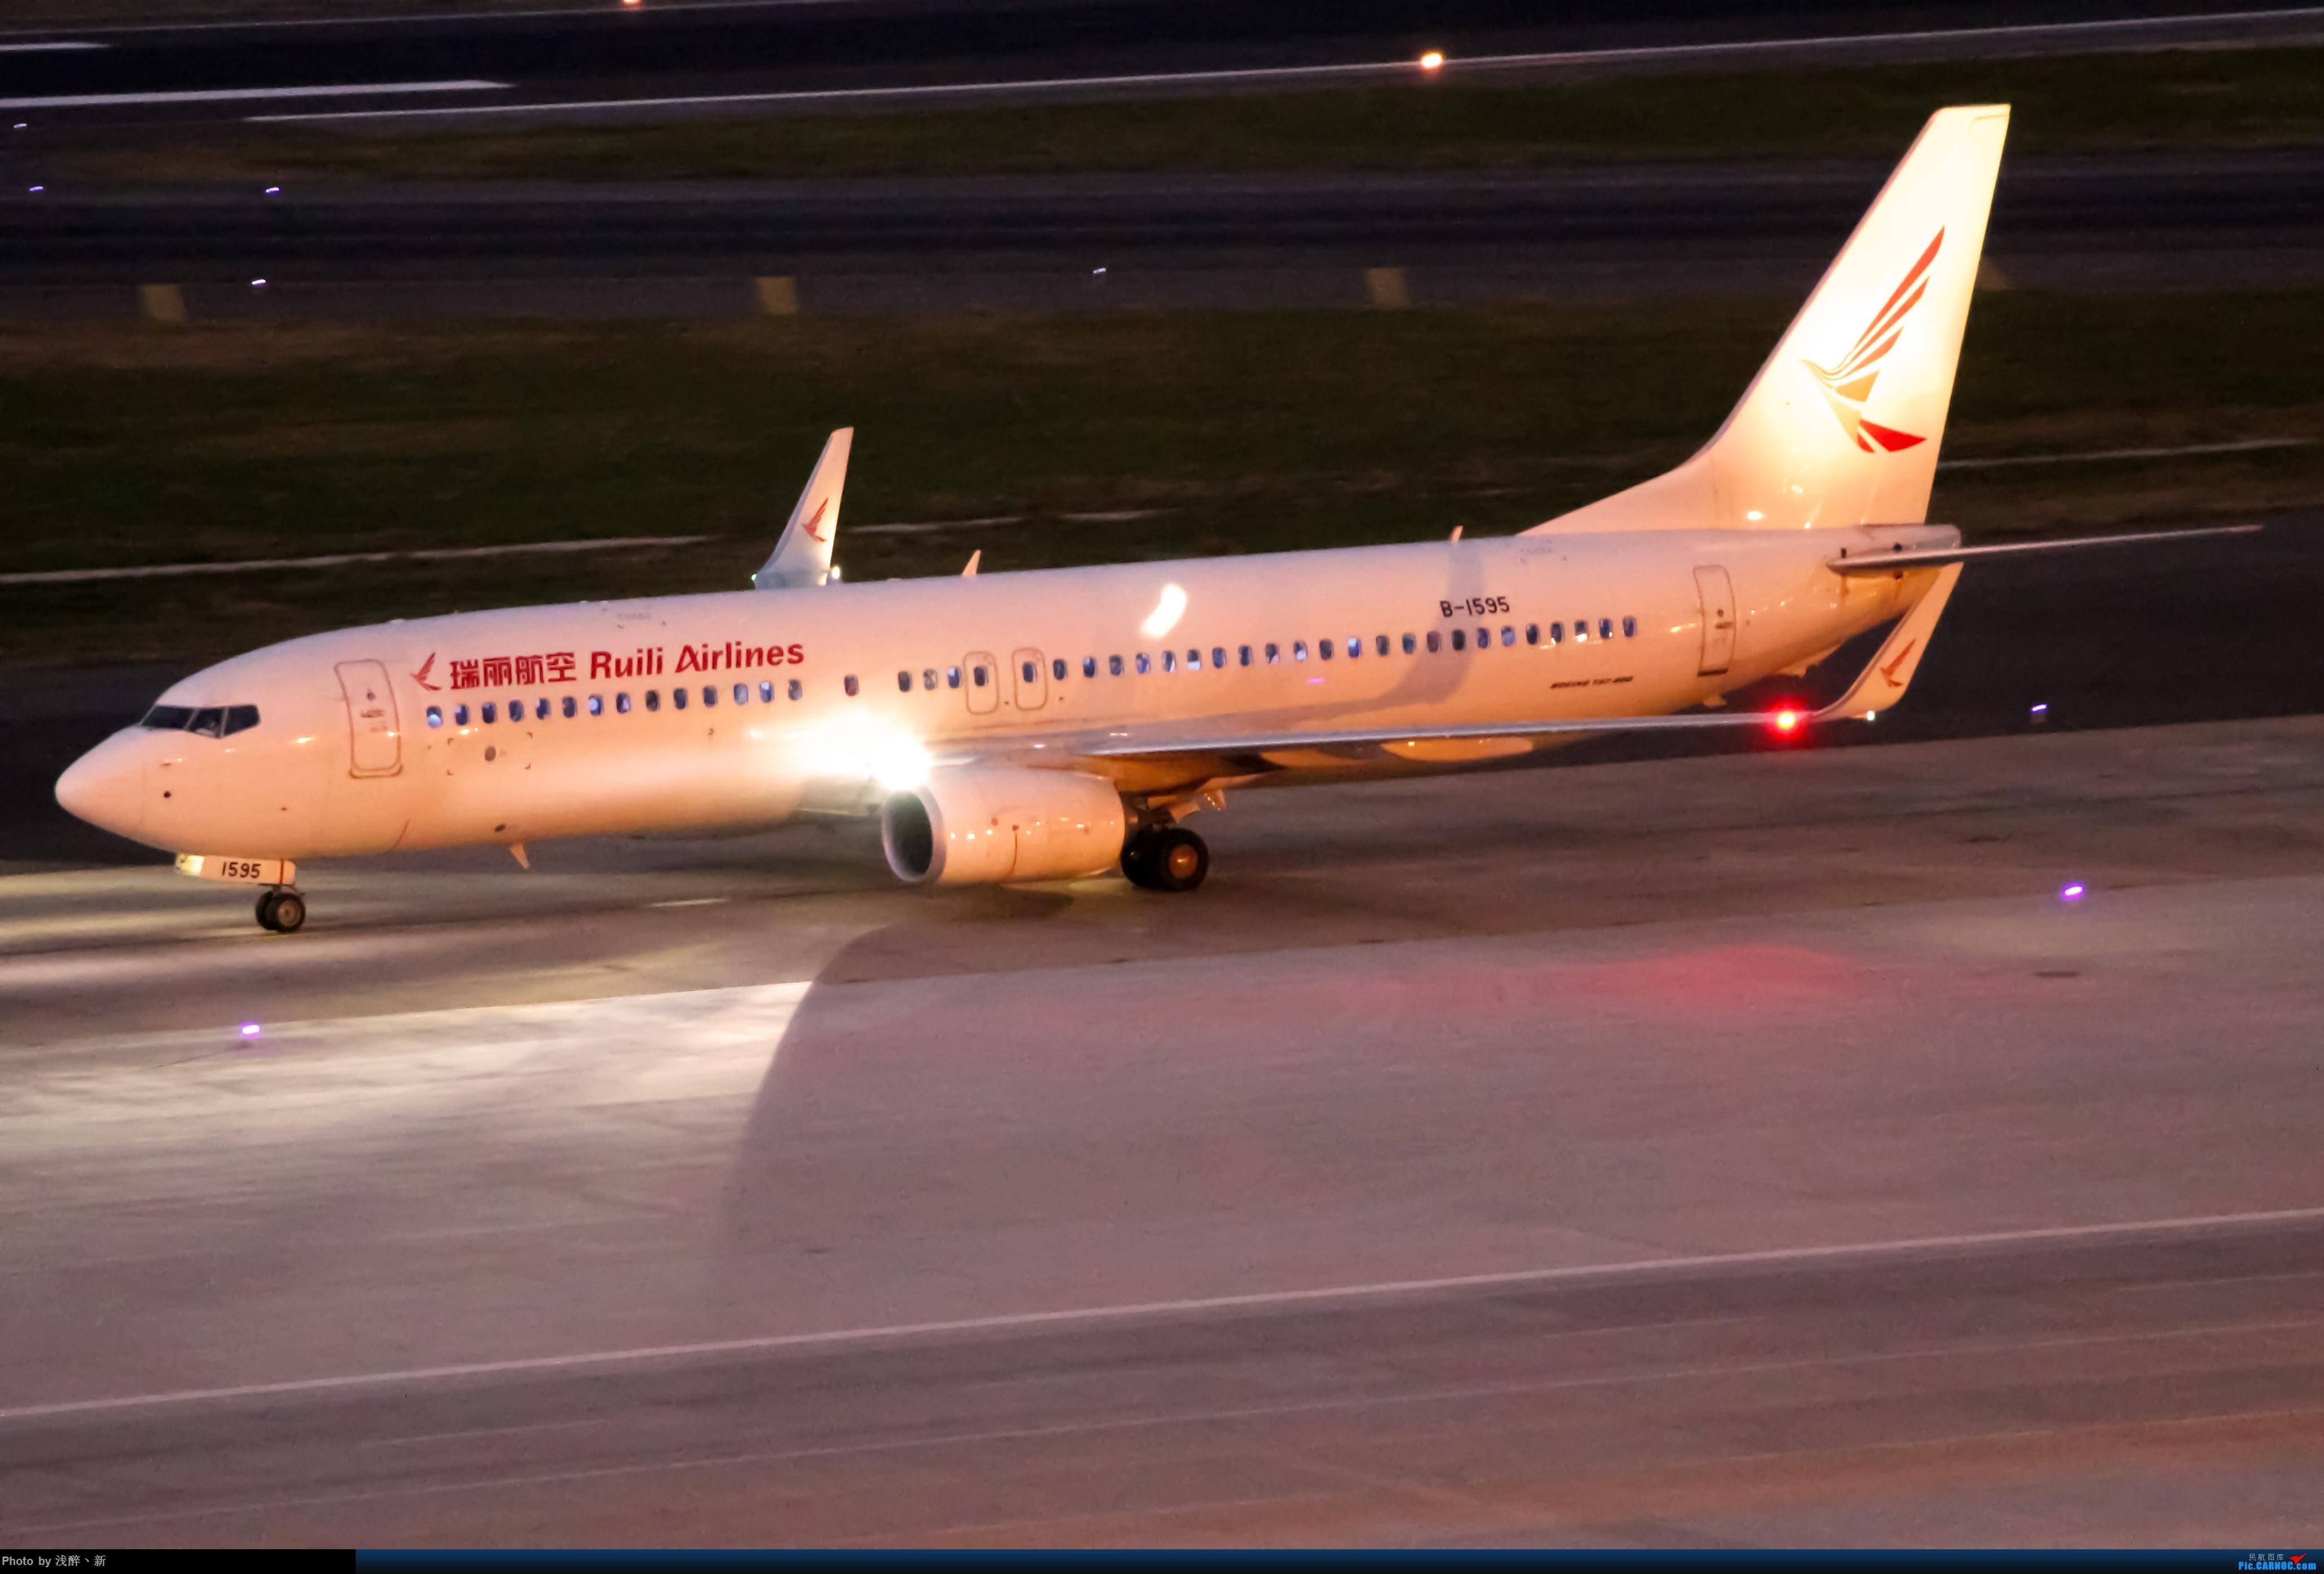 Re:[原创]DLC 9.15 日常杂货 BOEING 737-800 B-1595 中国大连国际机场